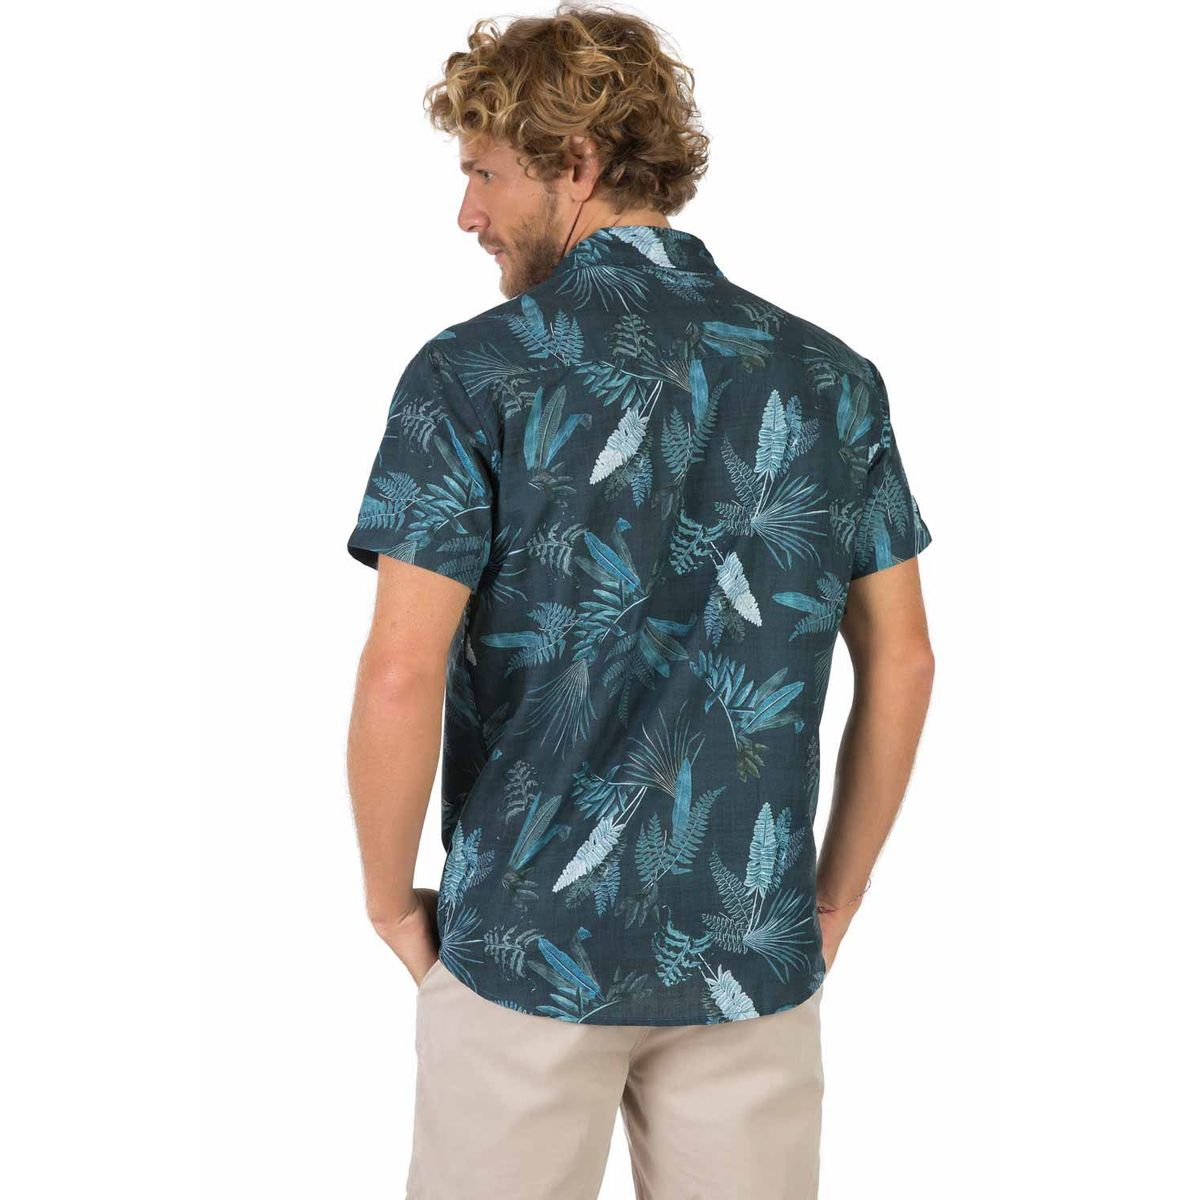 Camisa Estampada Azul Petróleo - Taco b0013300843